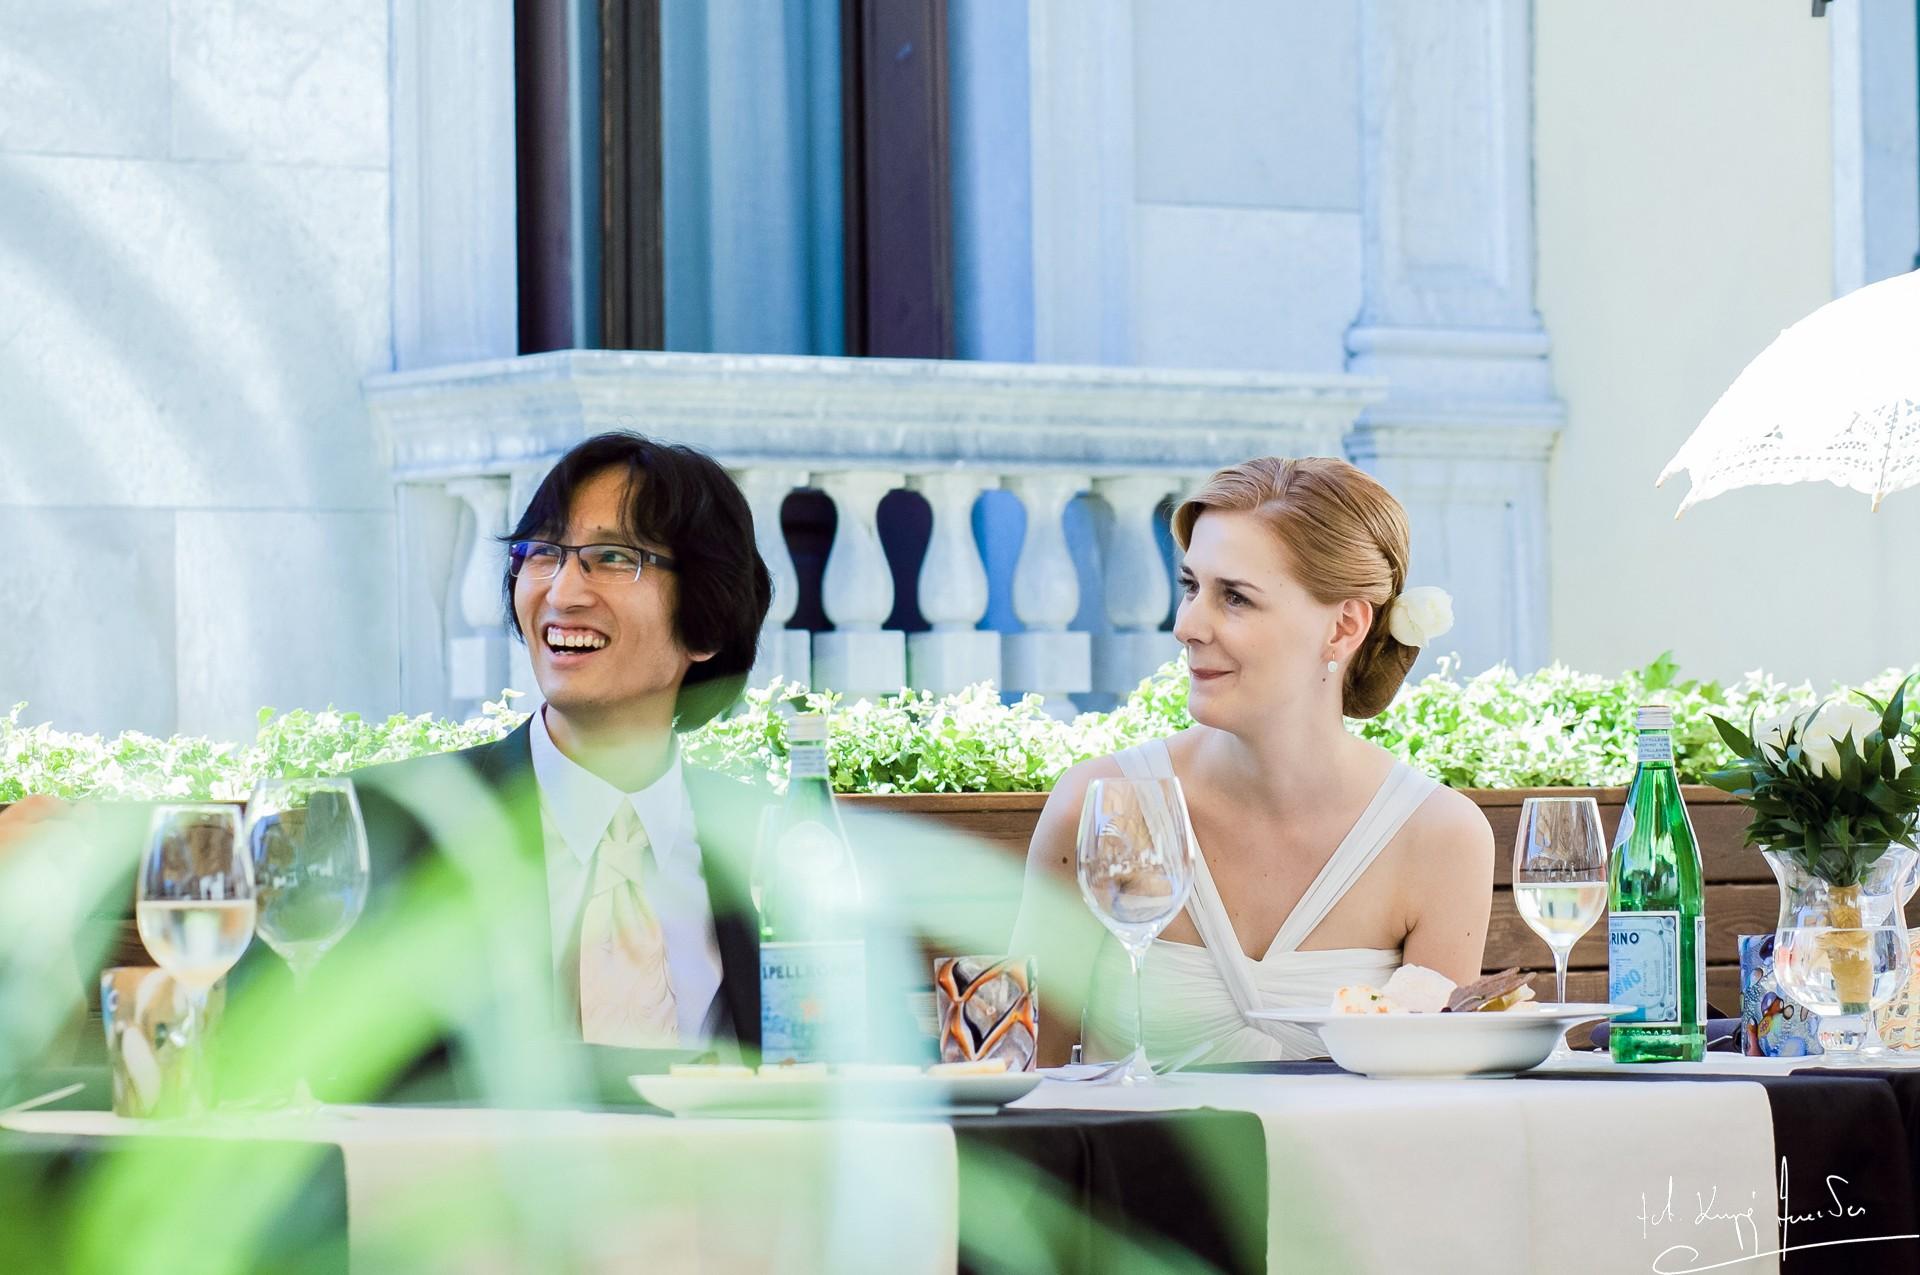 Ślub w wenecji 62 Manuela Luiza & Young Seon Song